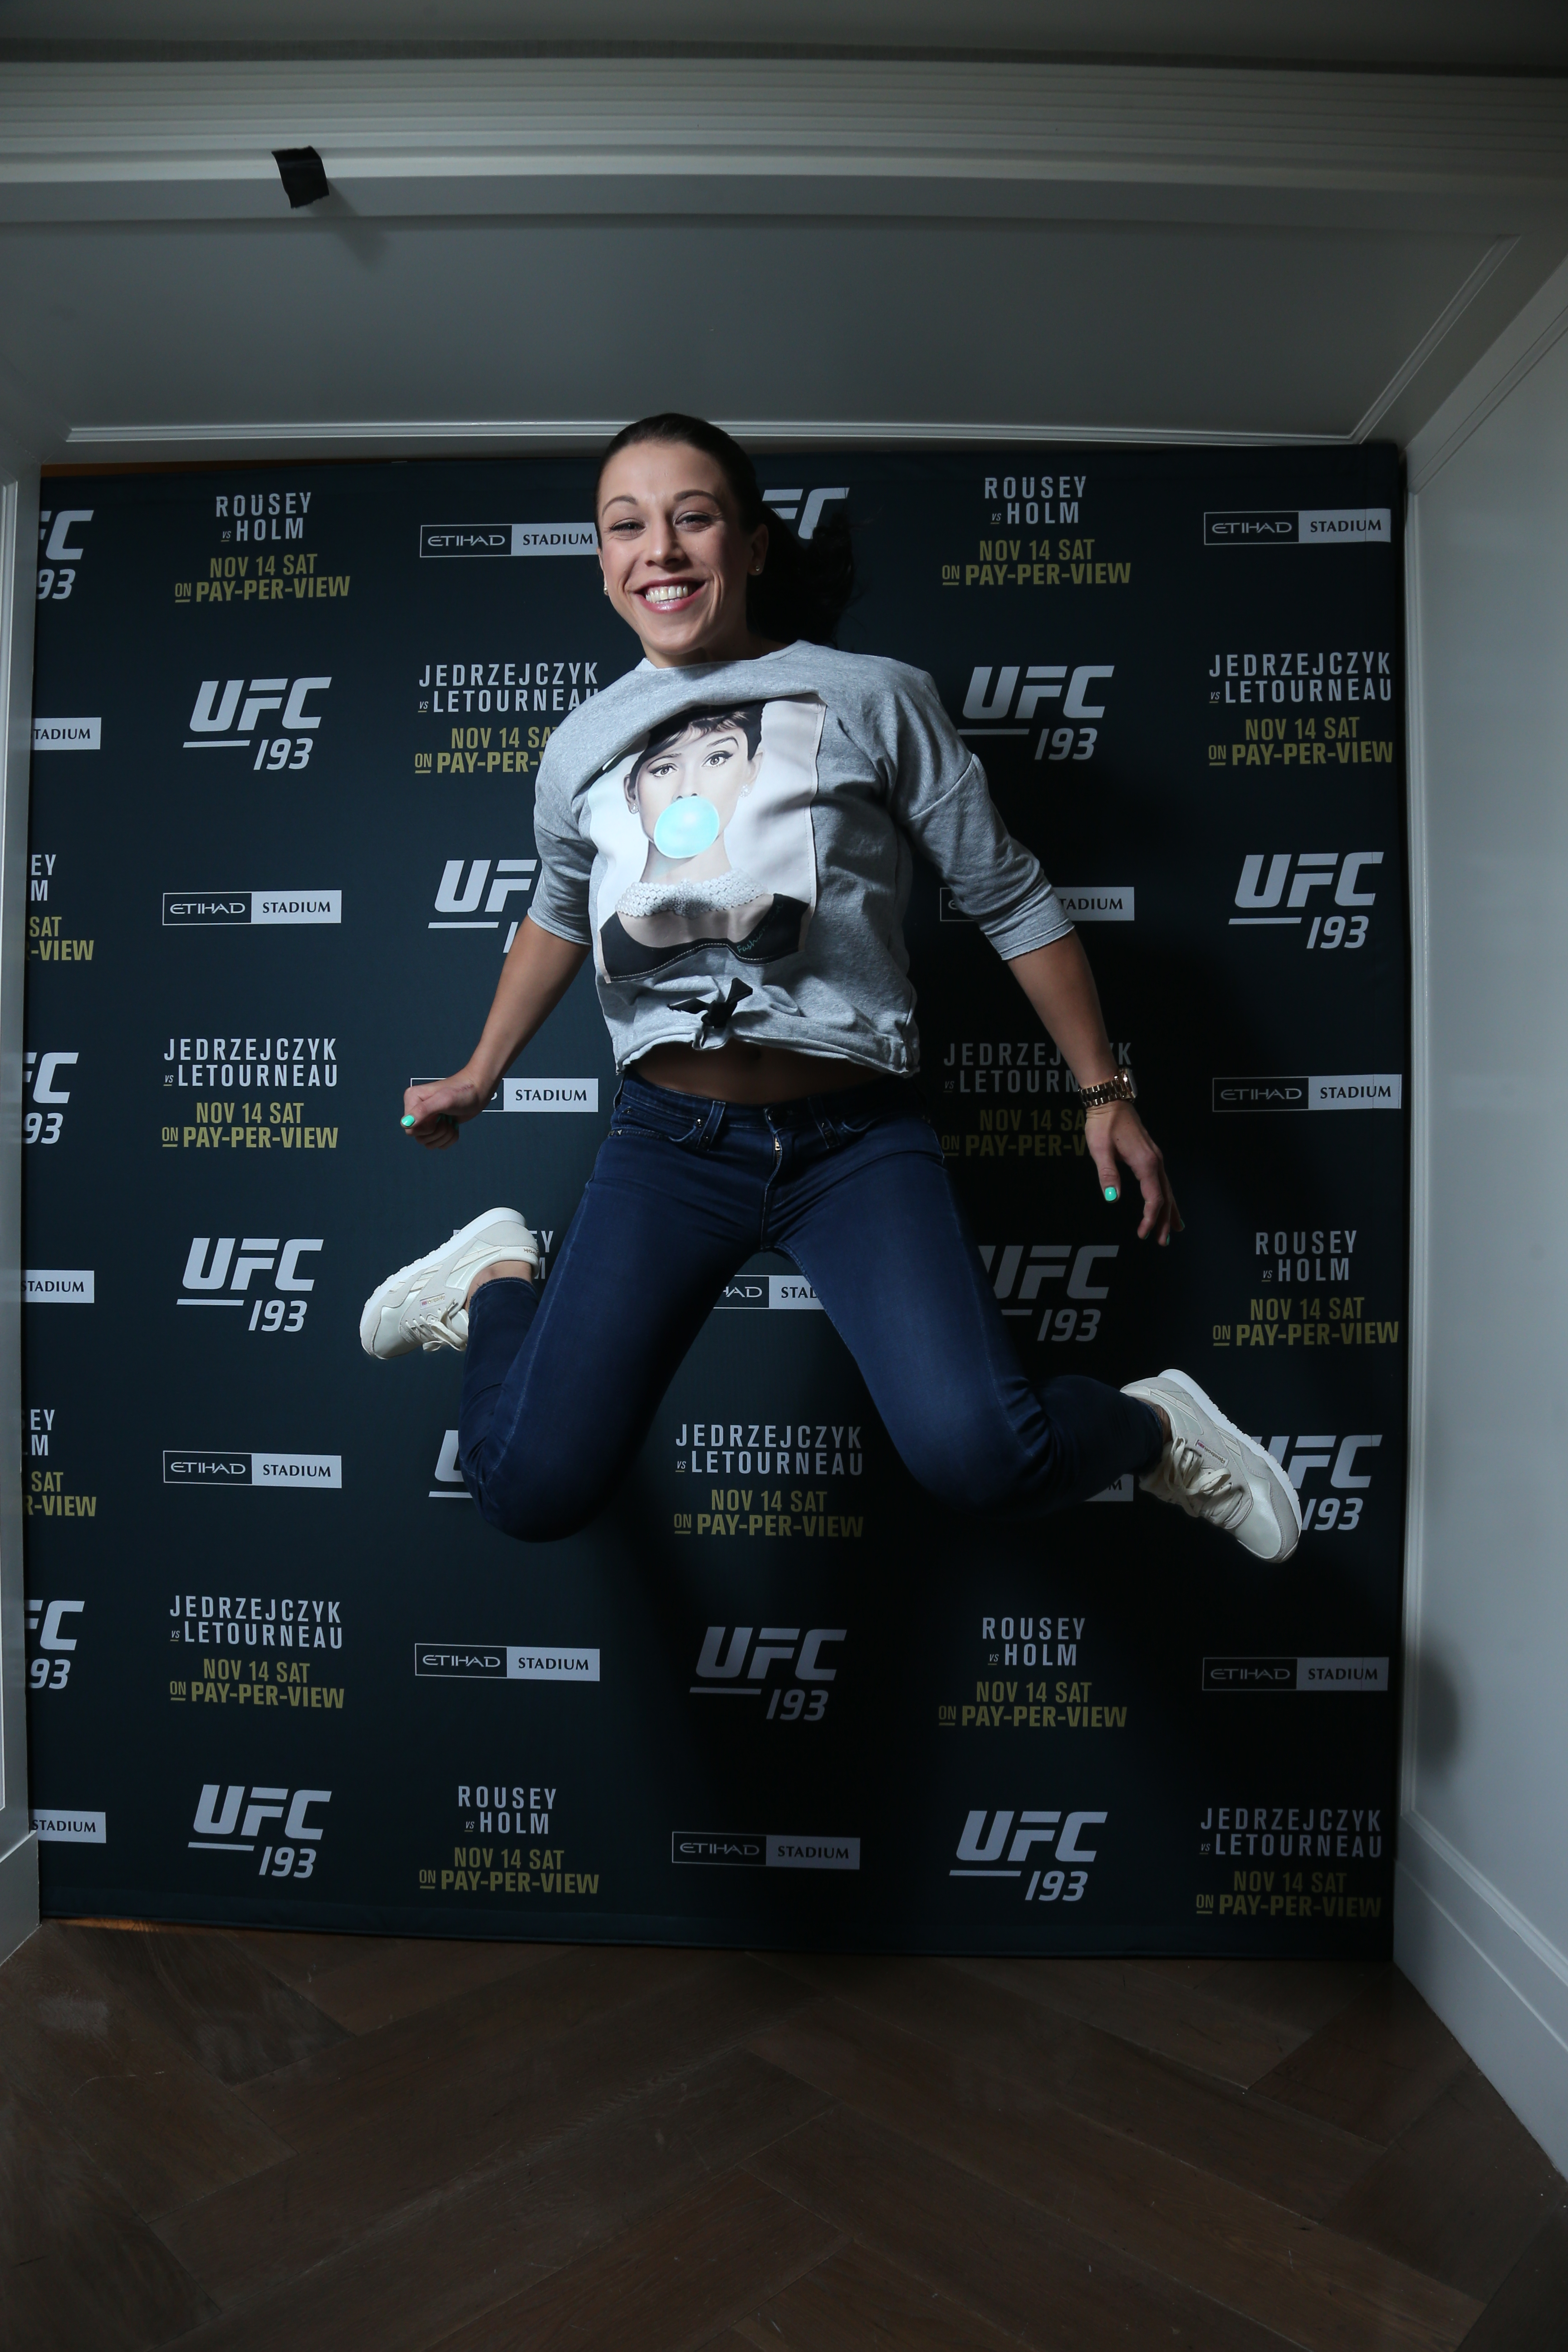 UFC Fighter Joanna Jedrzejcyk